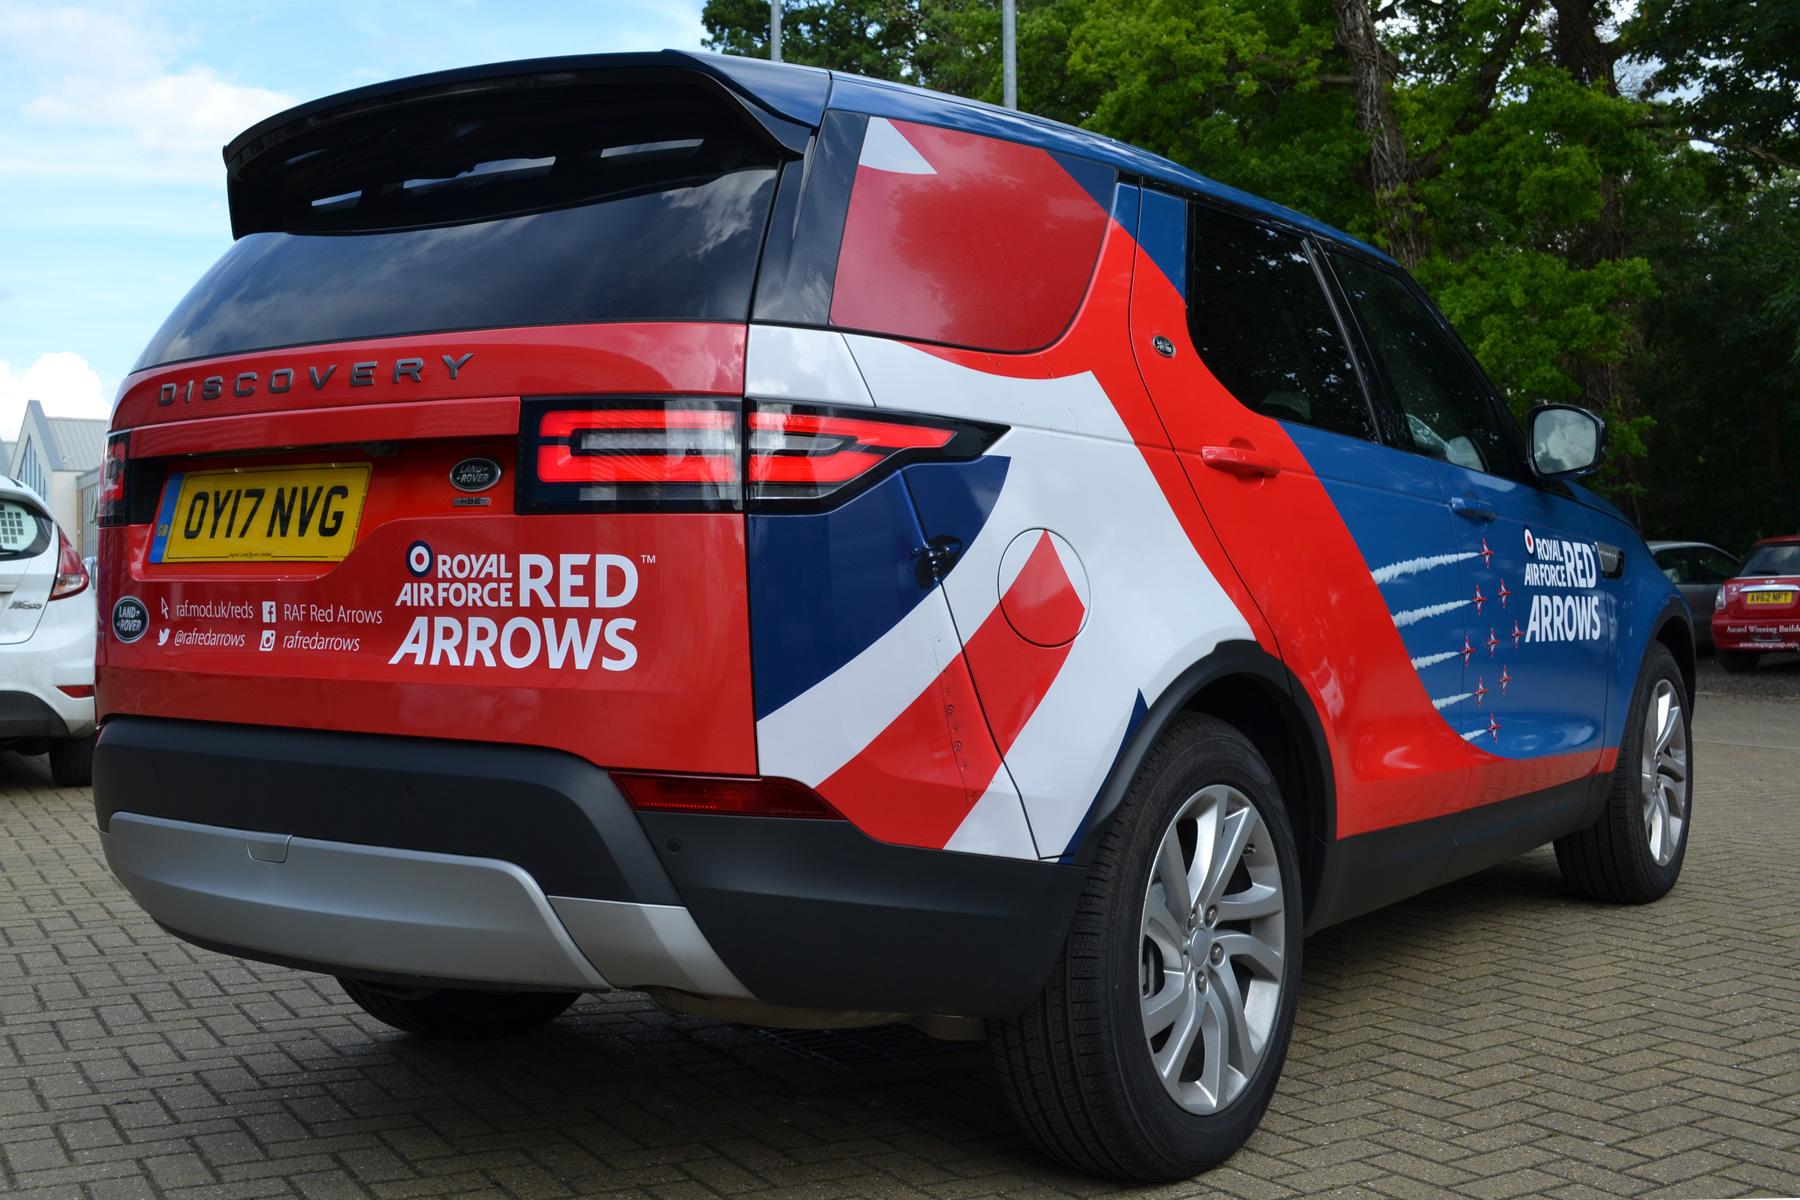 Aston Martin Cambridge & RAF Red Arrows – Coastline Graphics